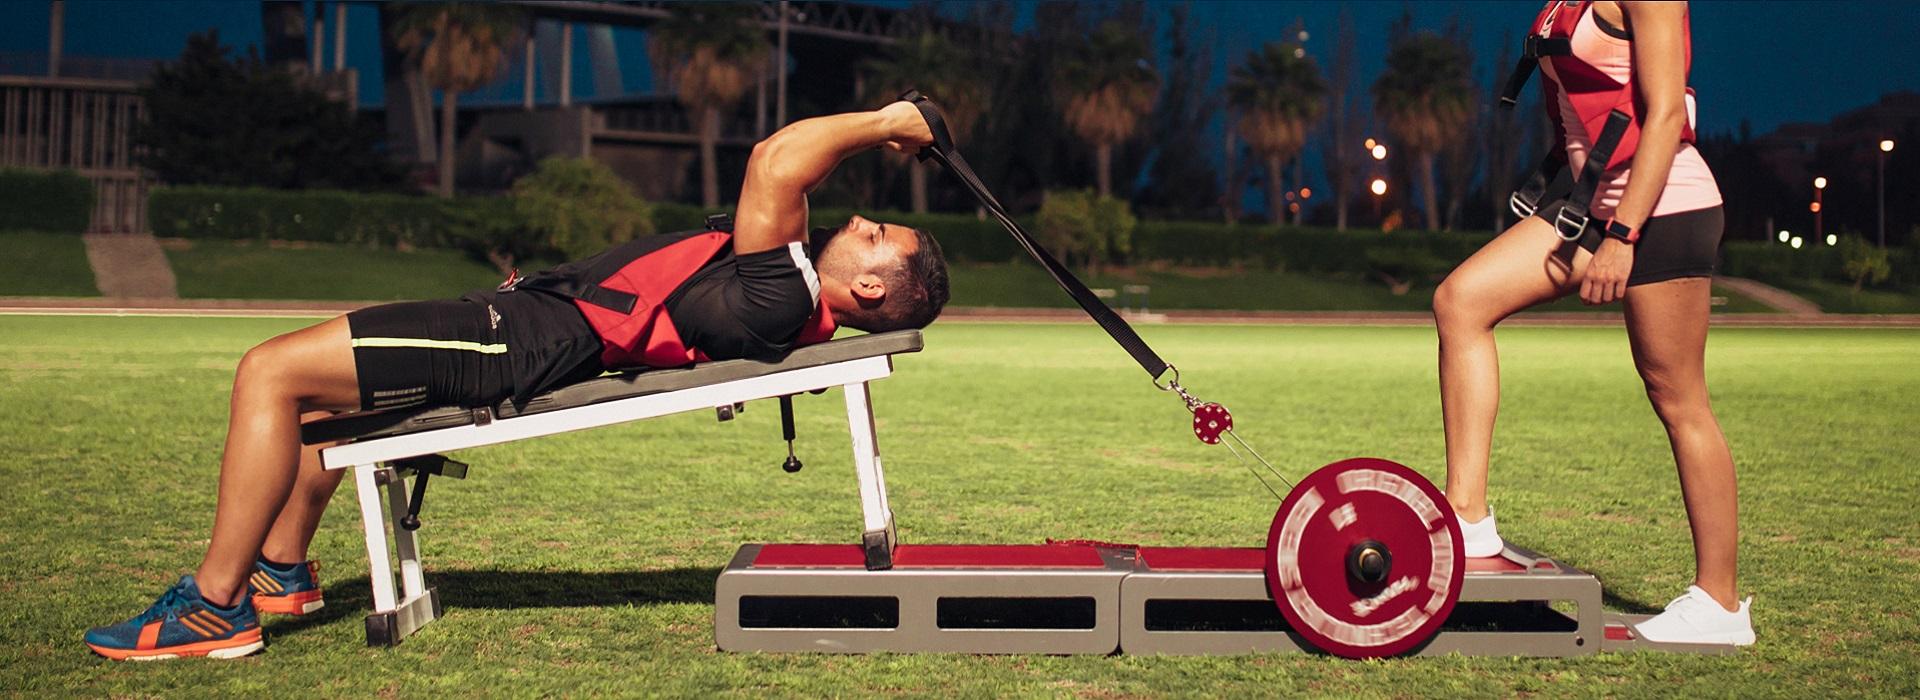 Enhance your performance